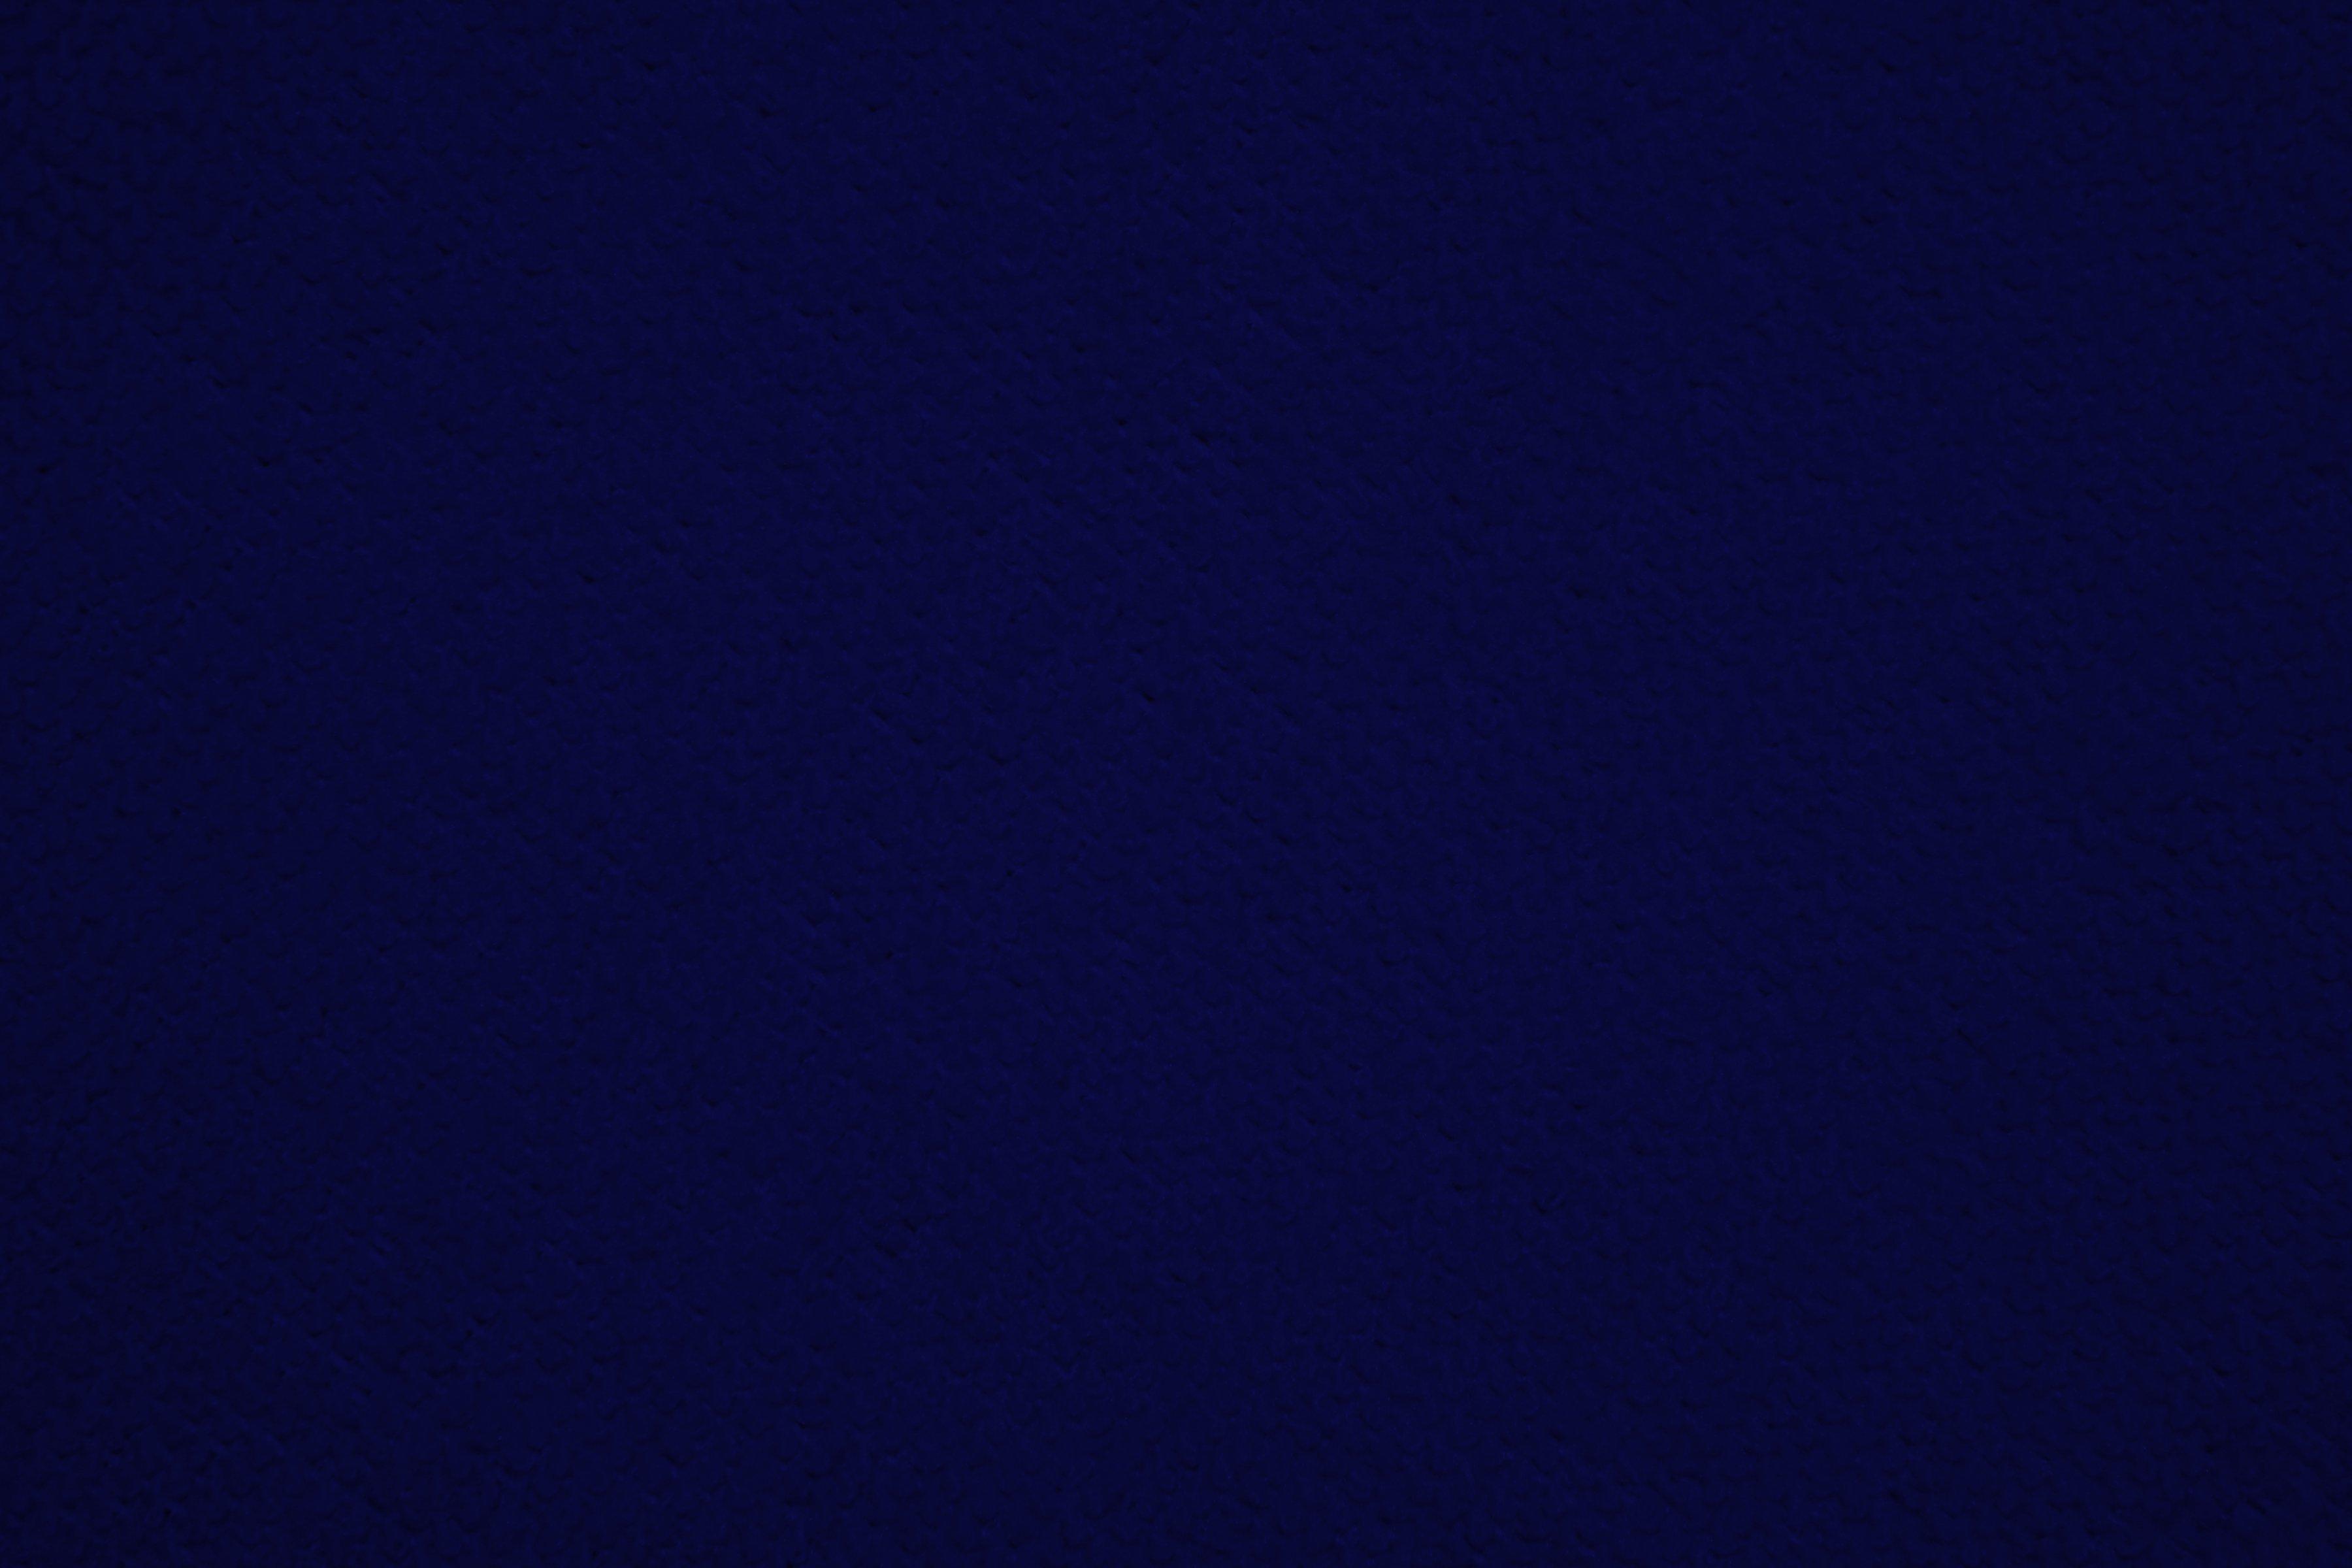 Navy Blue Microfiber Cloth Fabric Texture   High Resolution Photo 3600x2400